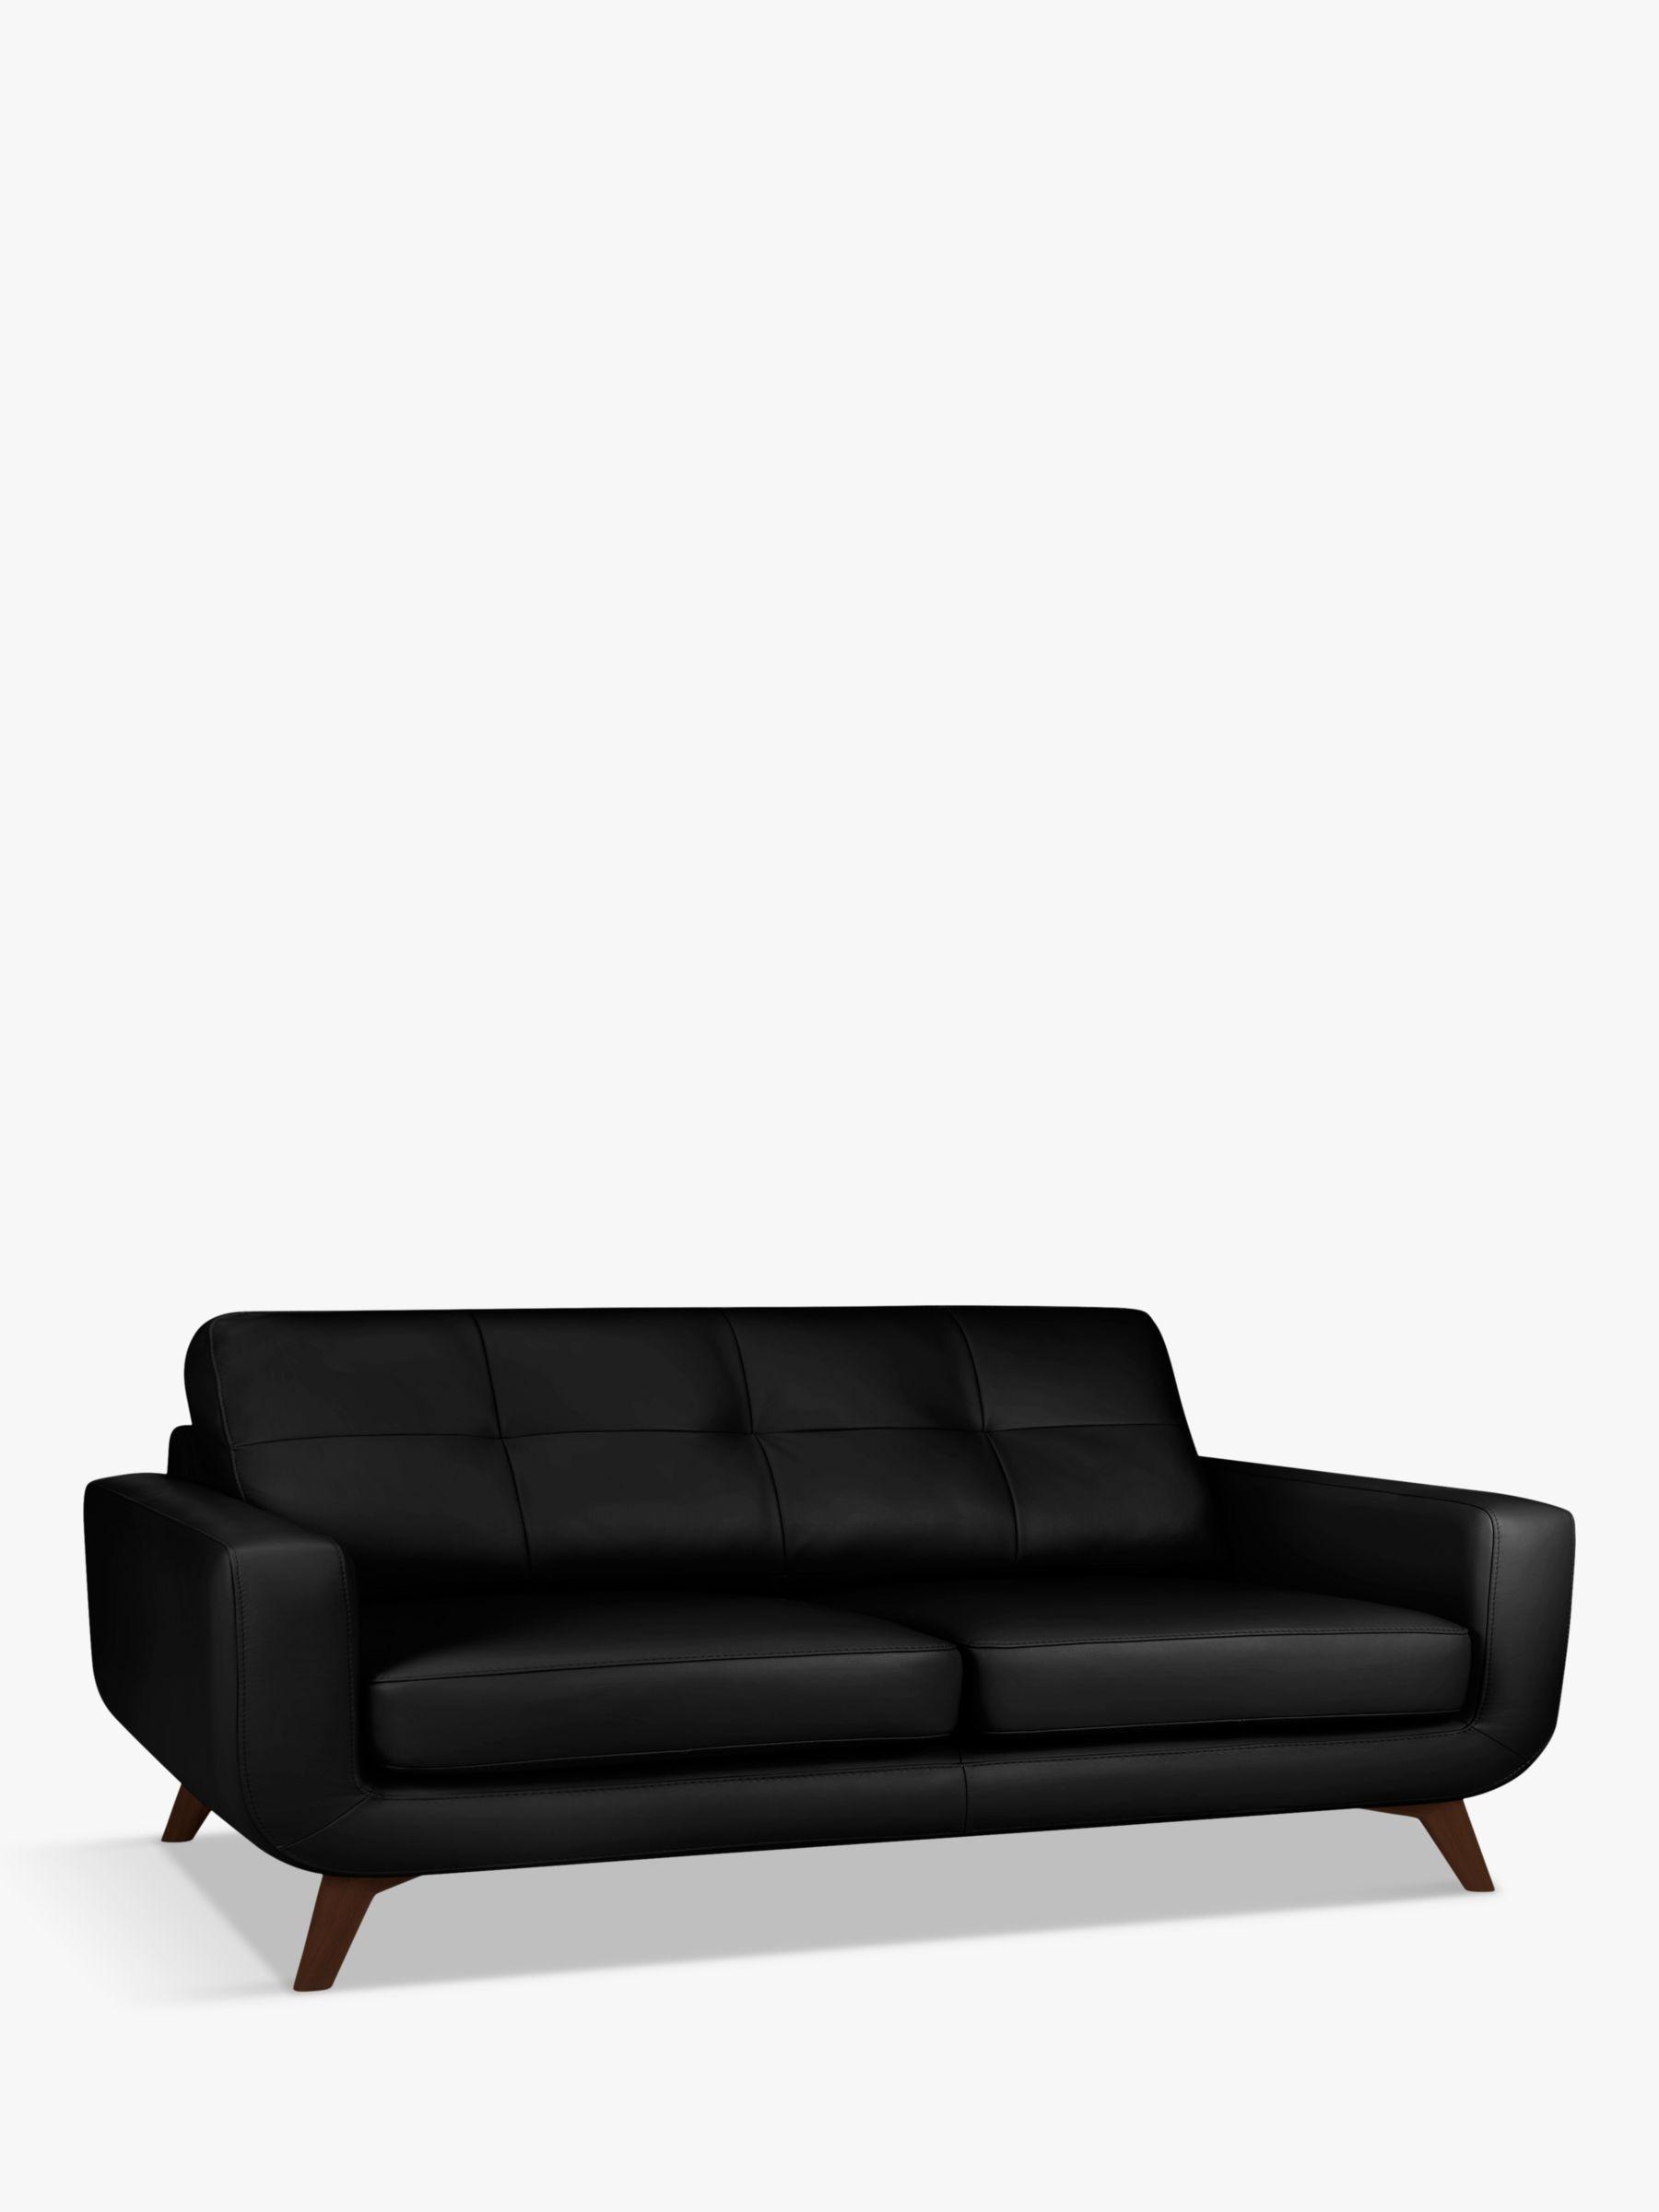 John Lewis Partners Barbican Grand 4 Seater Leather Sofa Dark